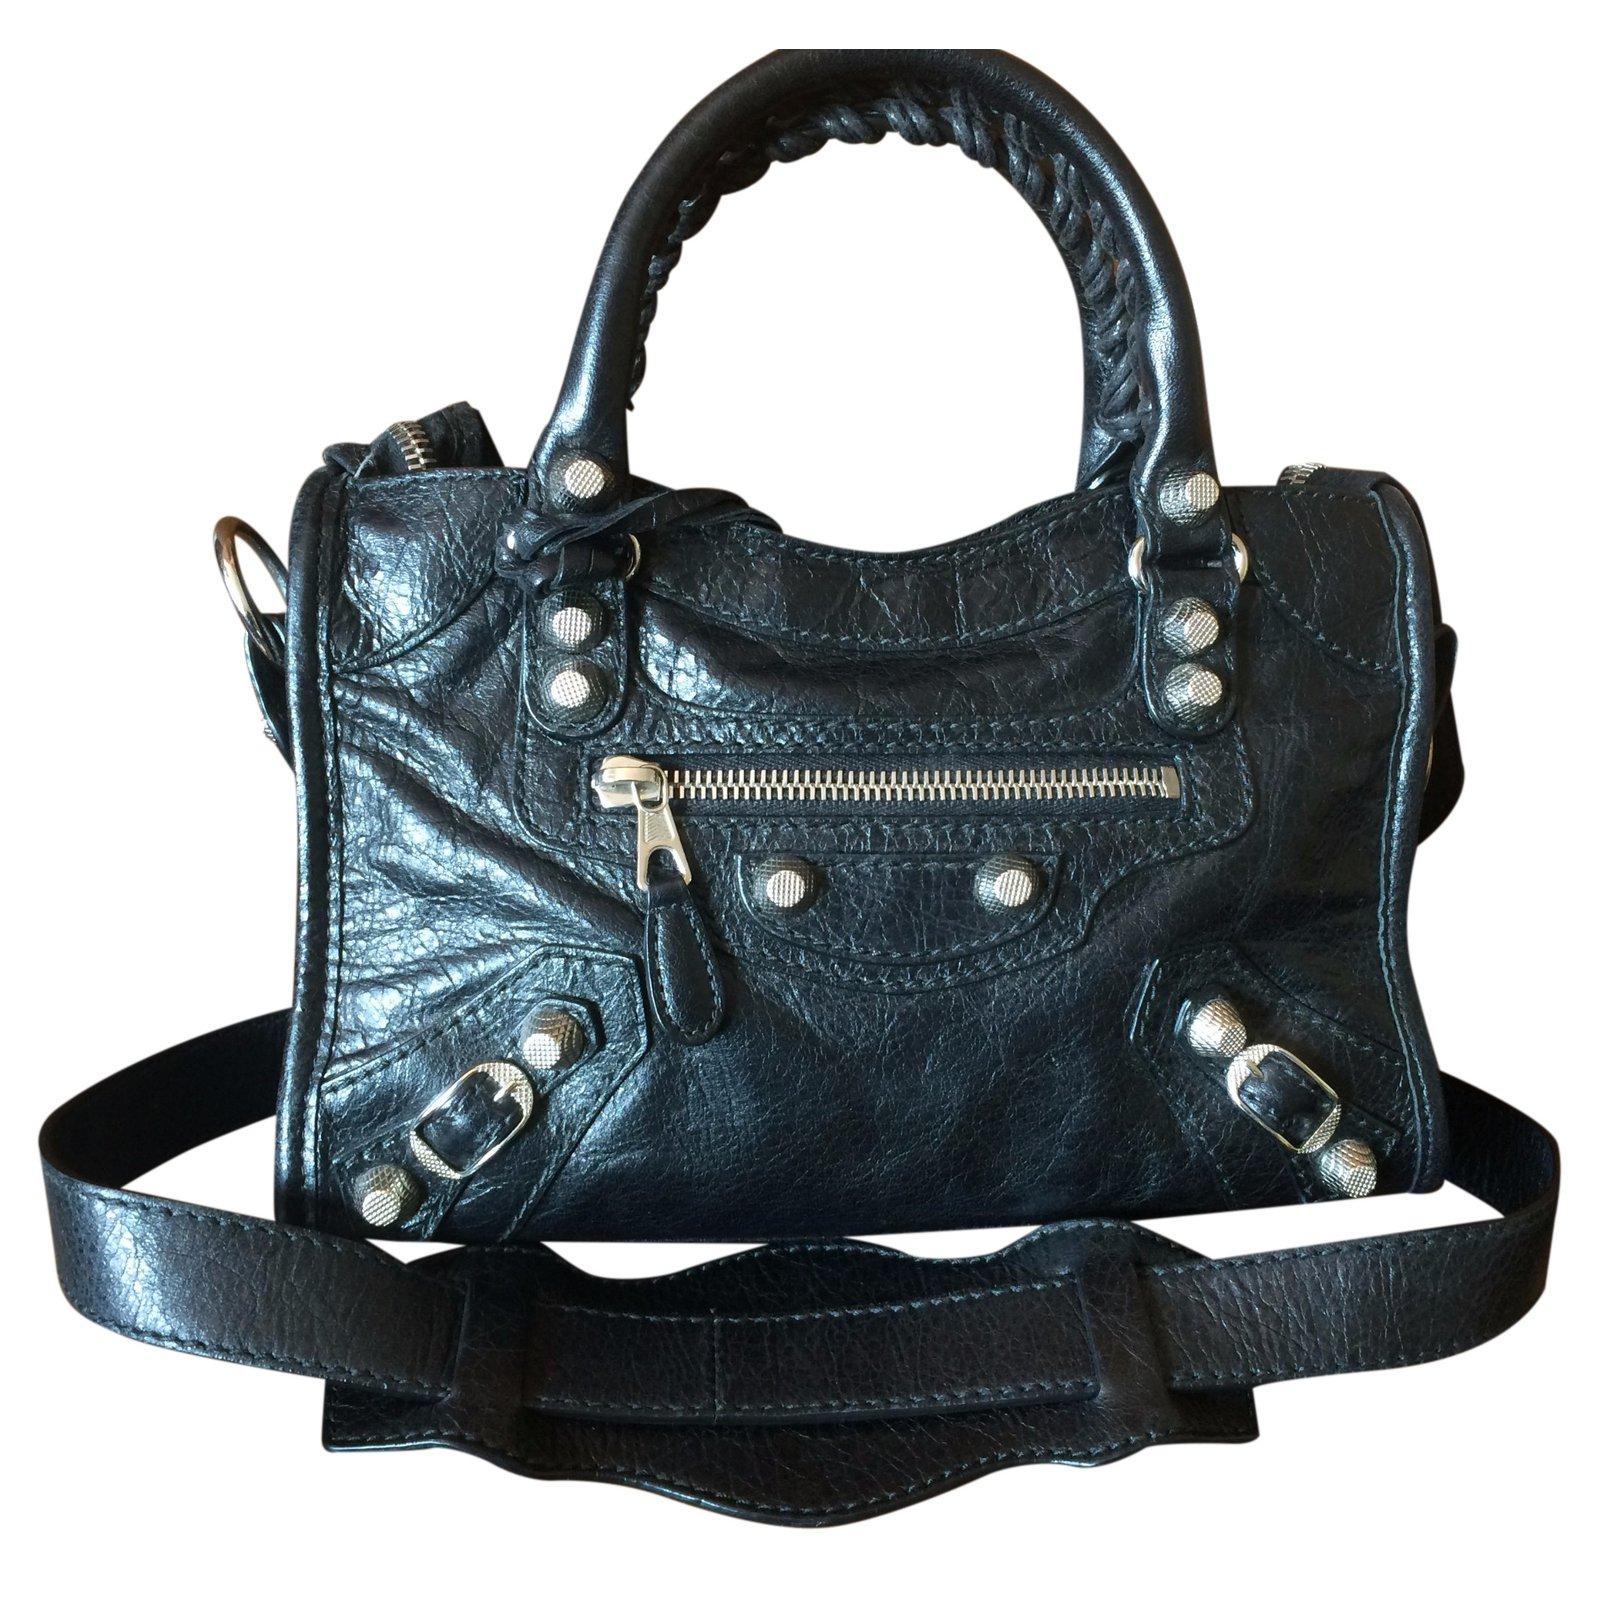 7ecb39e61967 Balenciaga Handbag Handbags Leather Black ref.25470 - Joli Closet